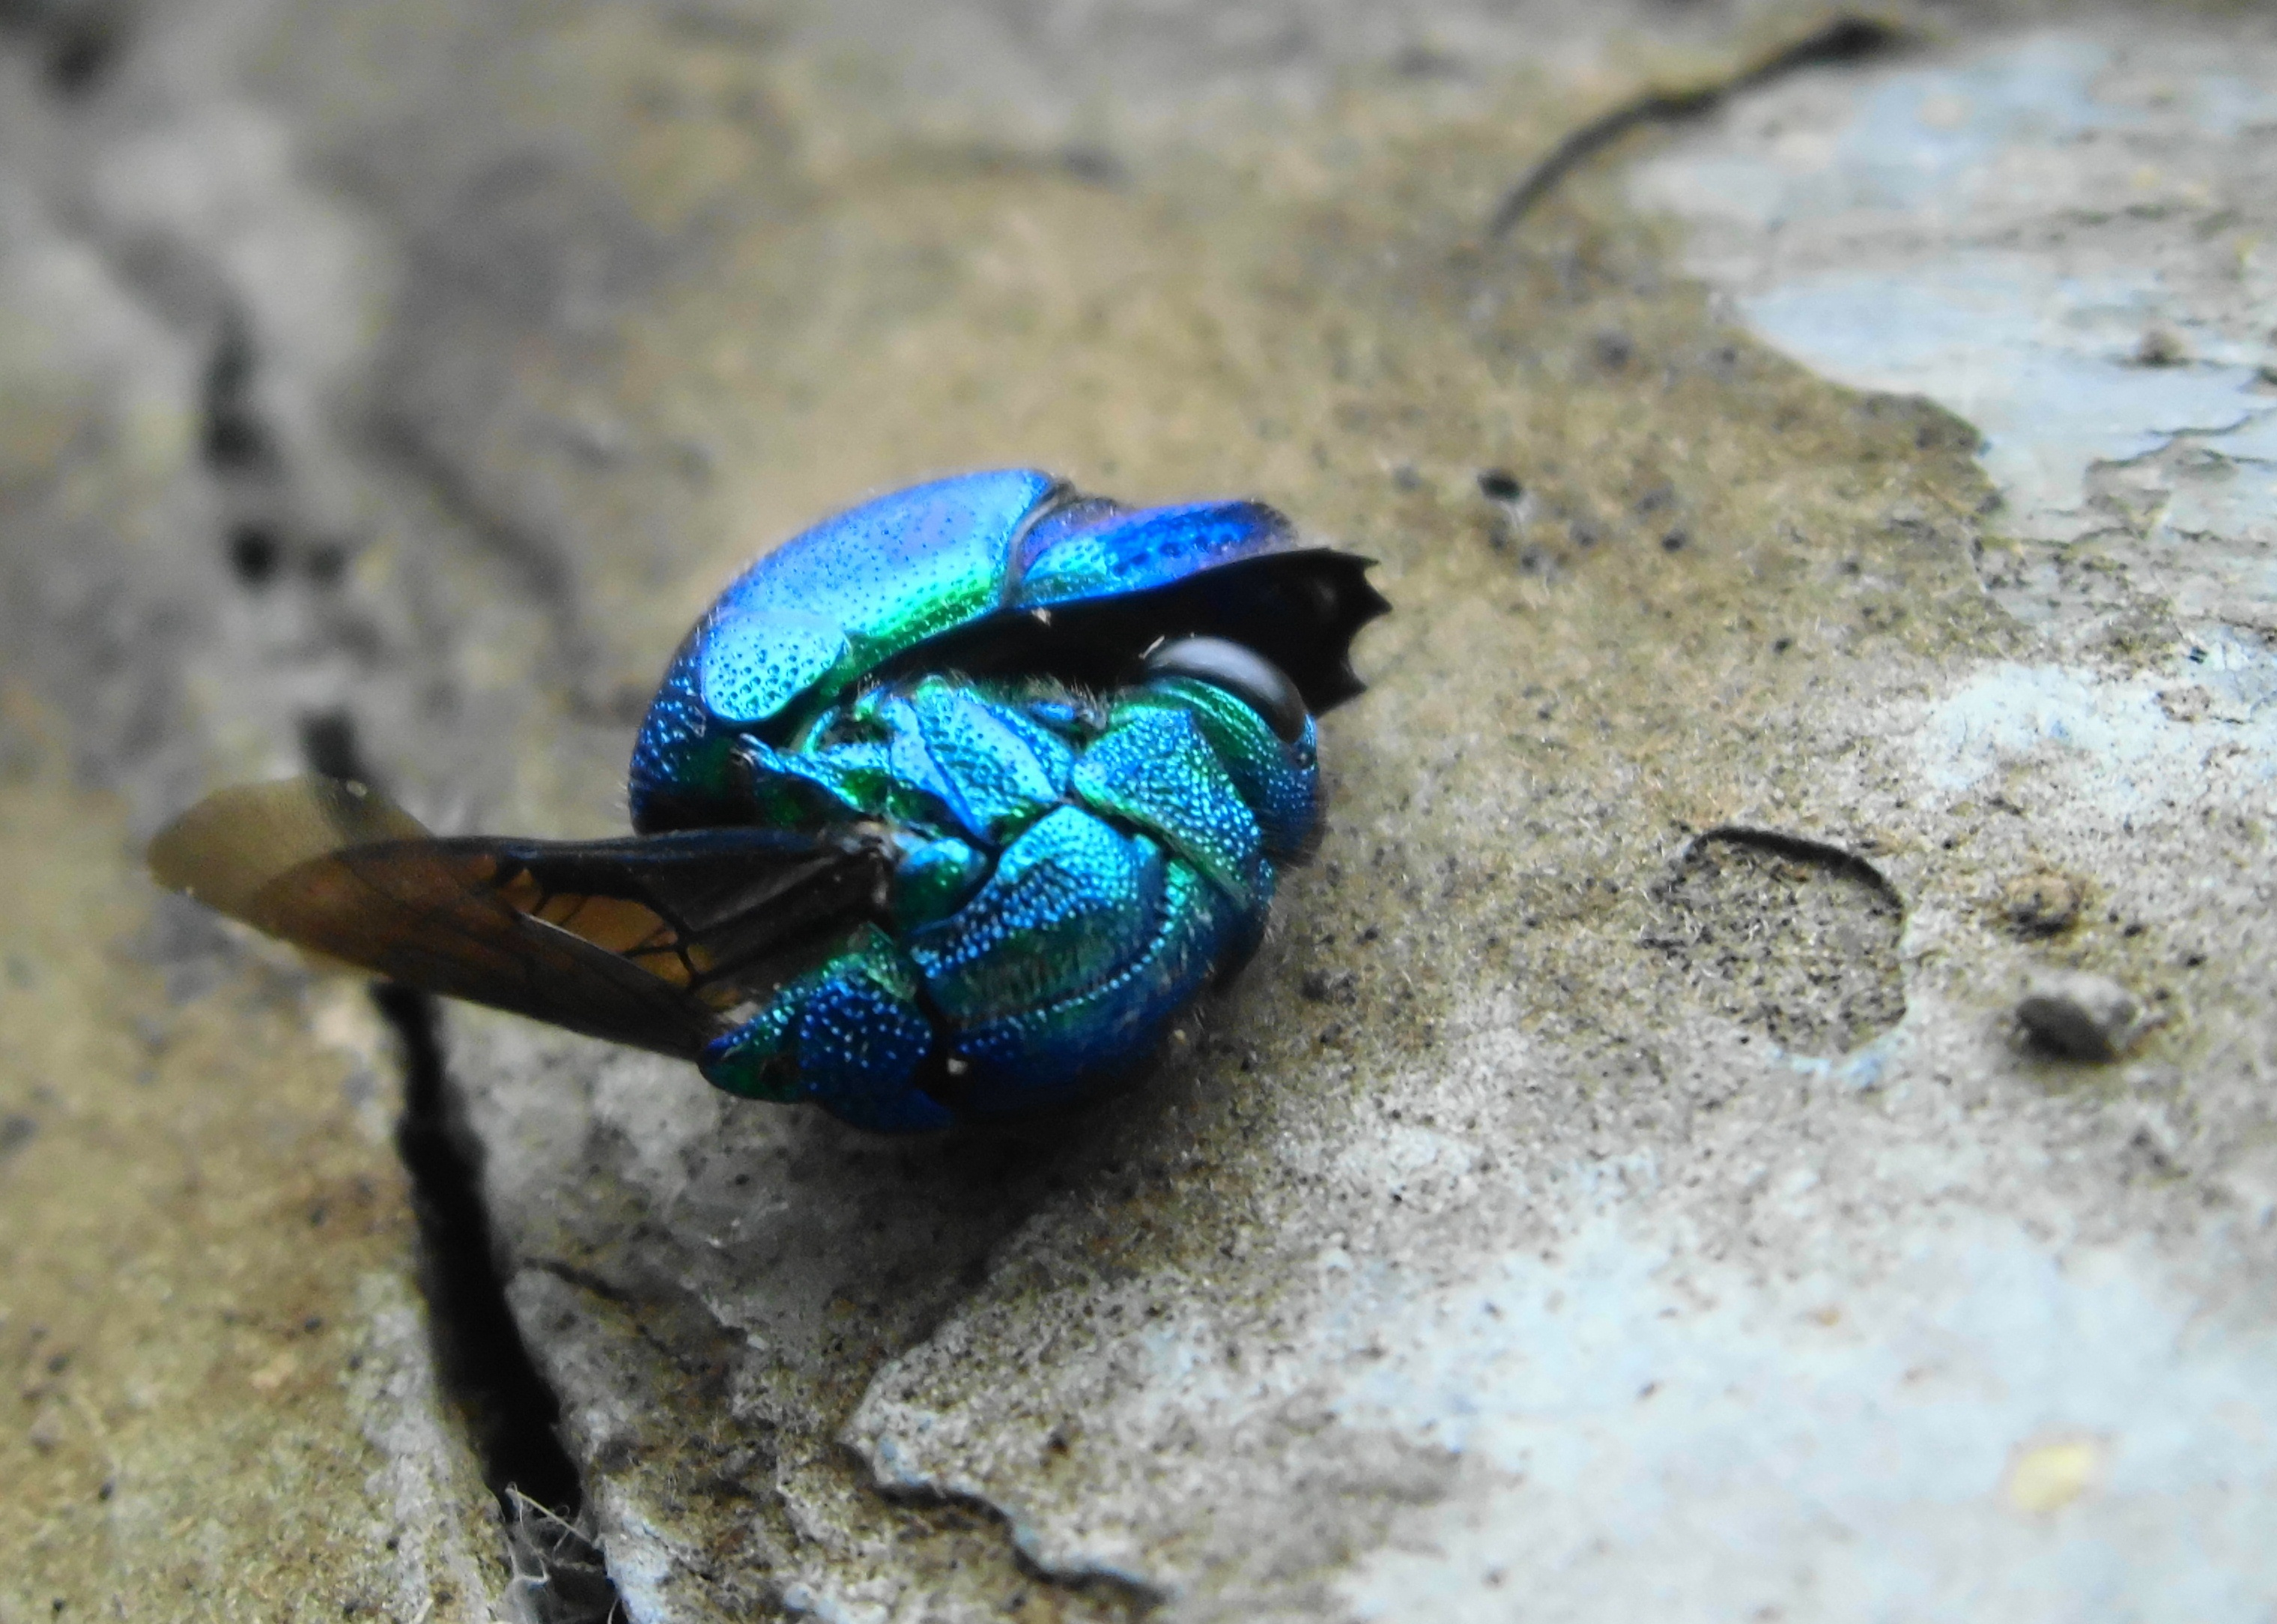 Cuckoo wasp curled up